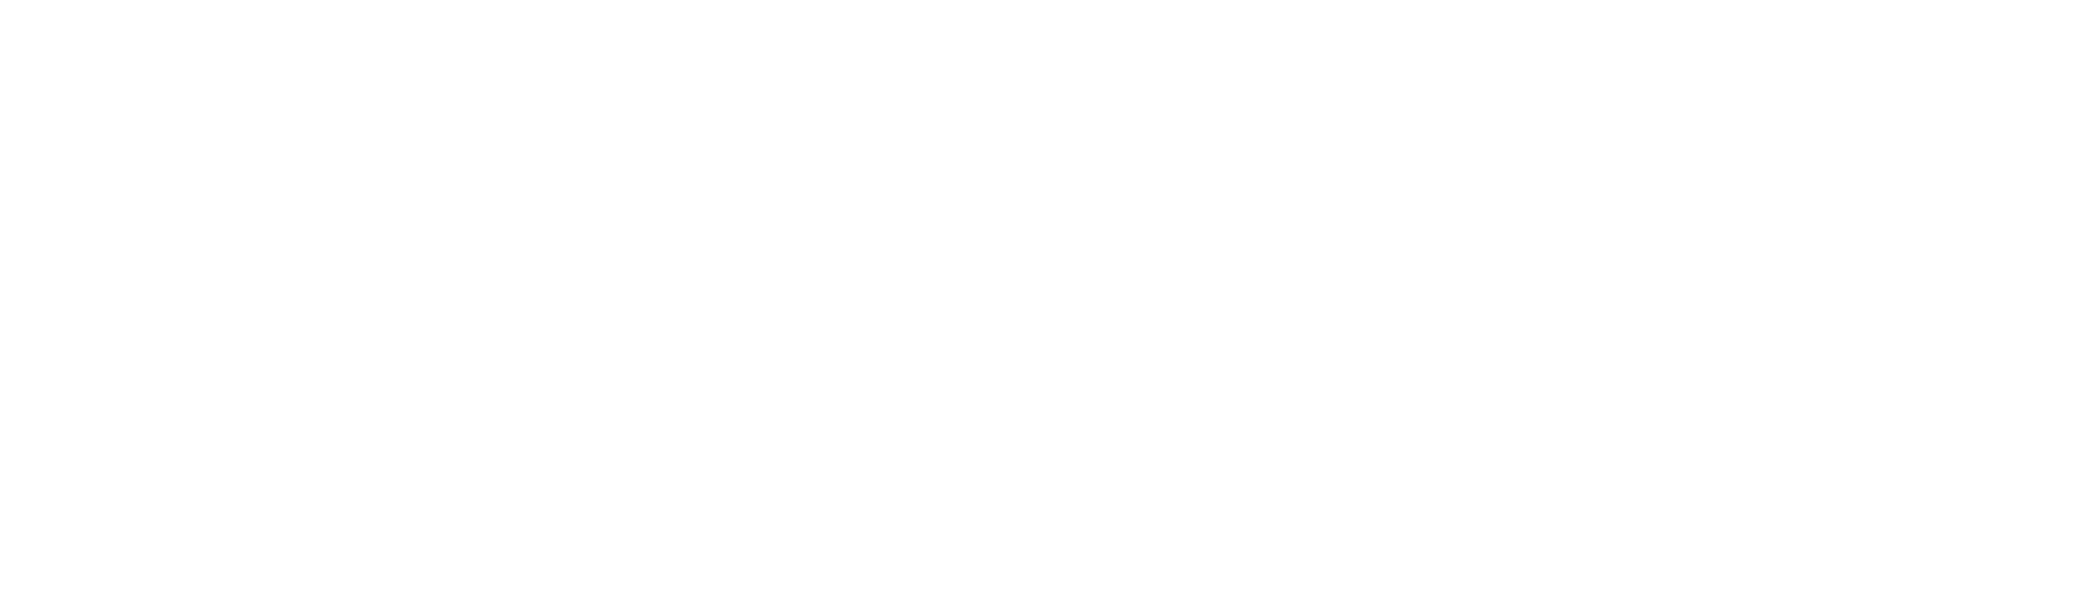 With Sugar